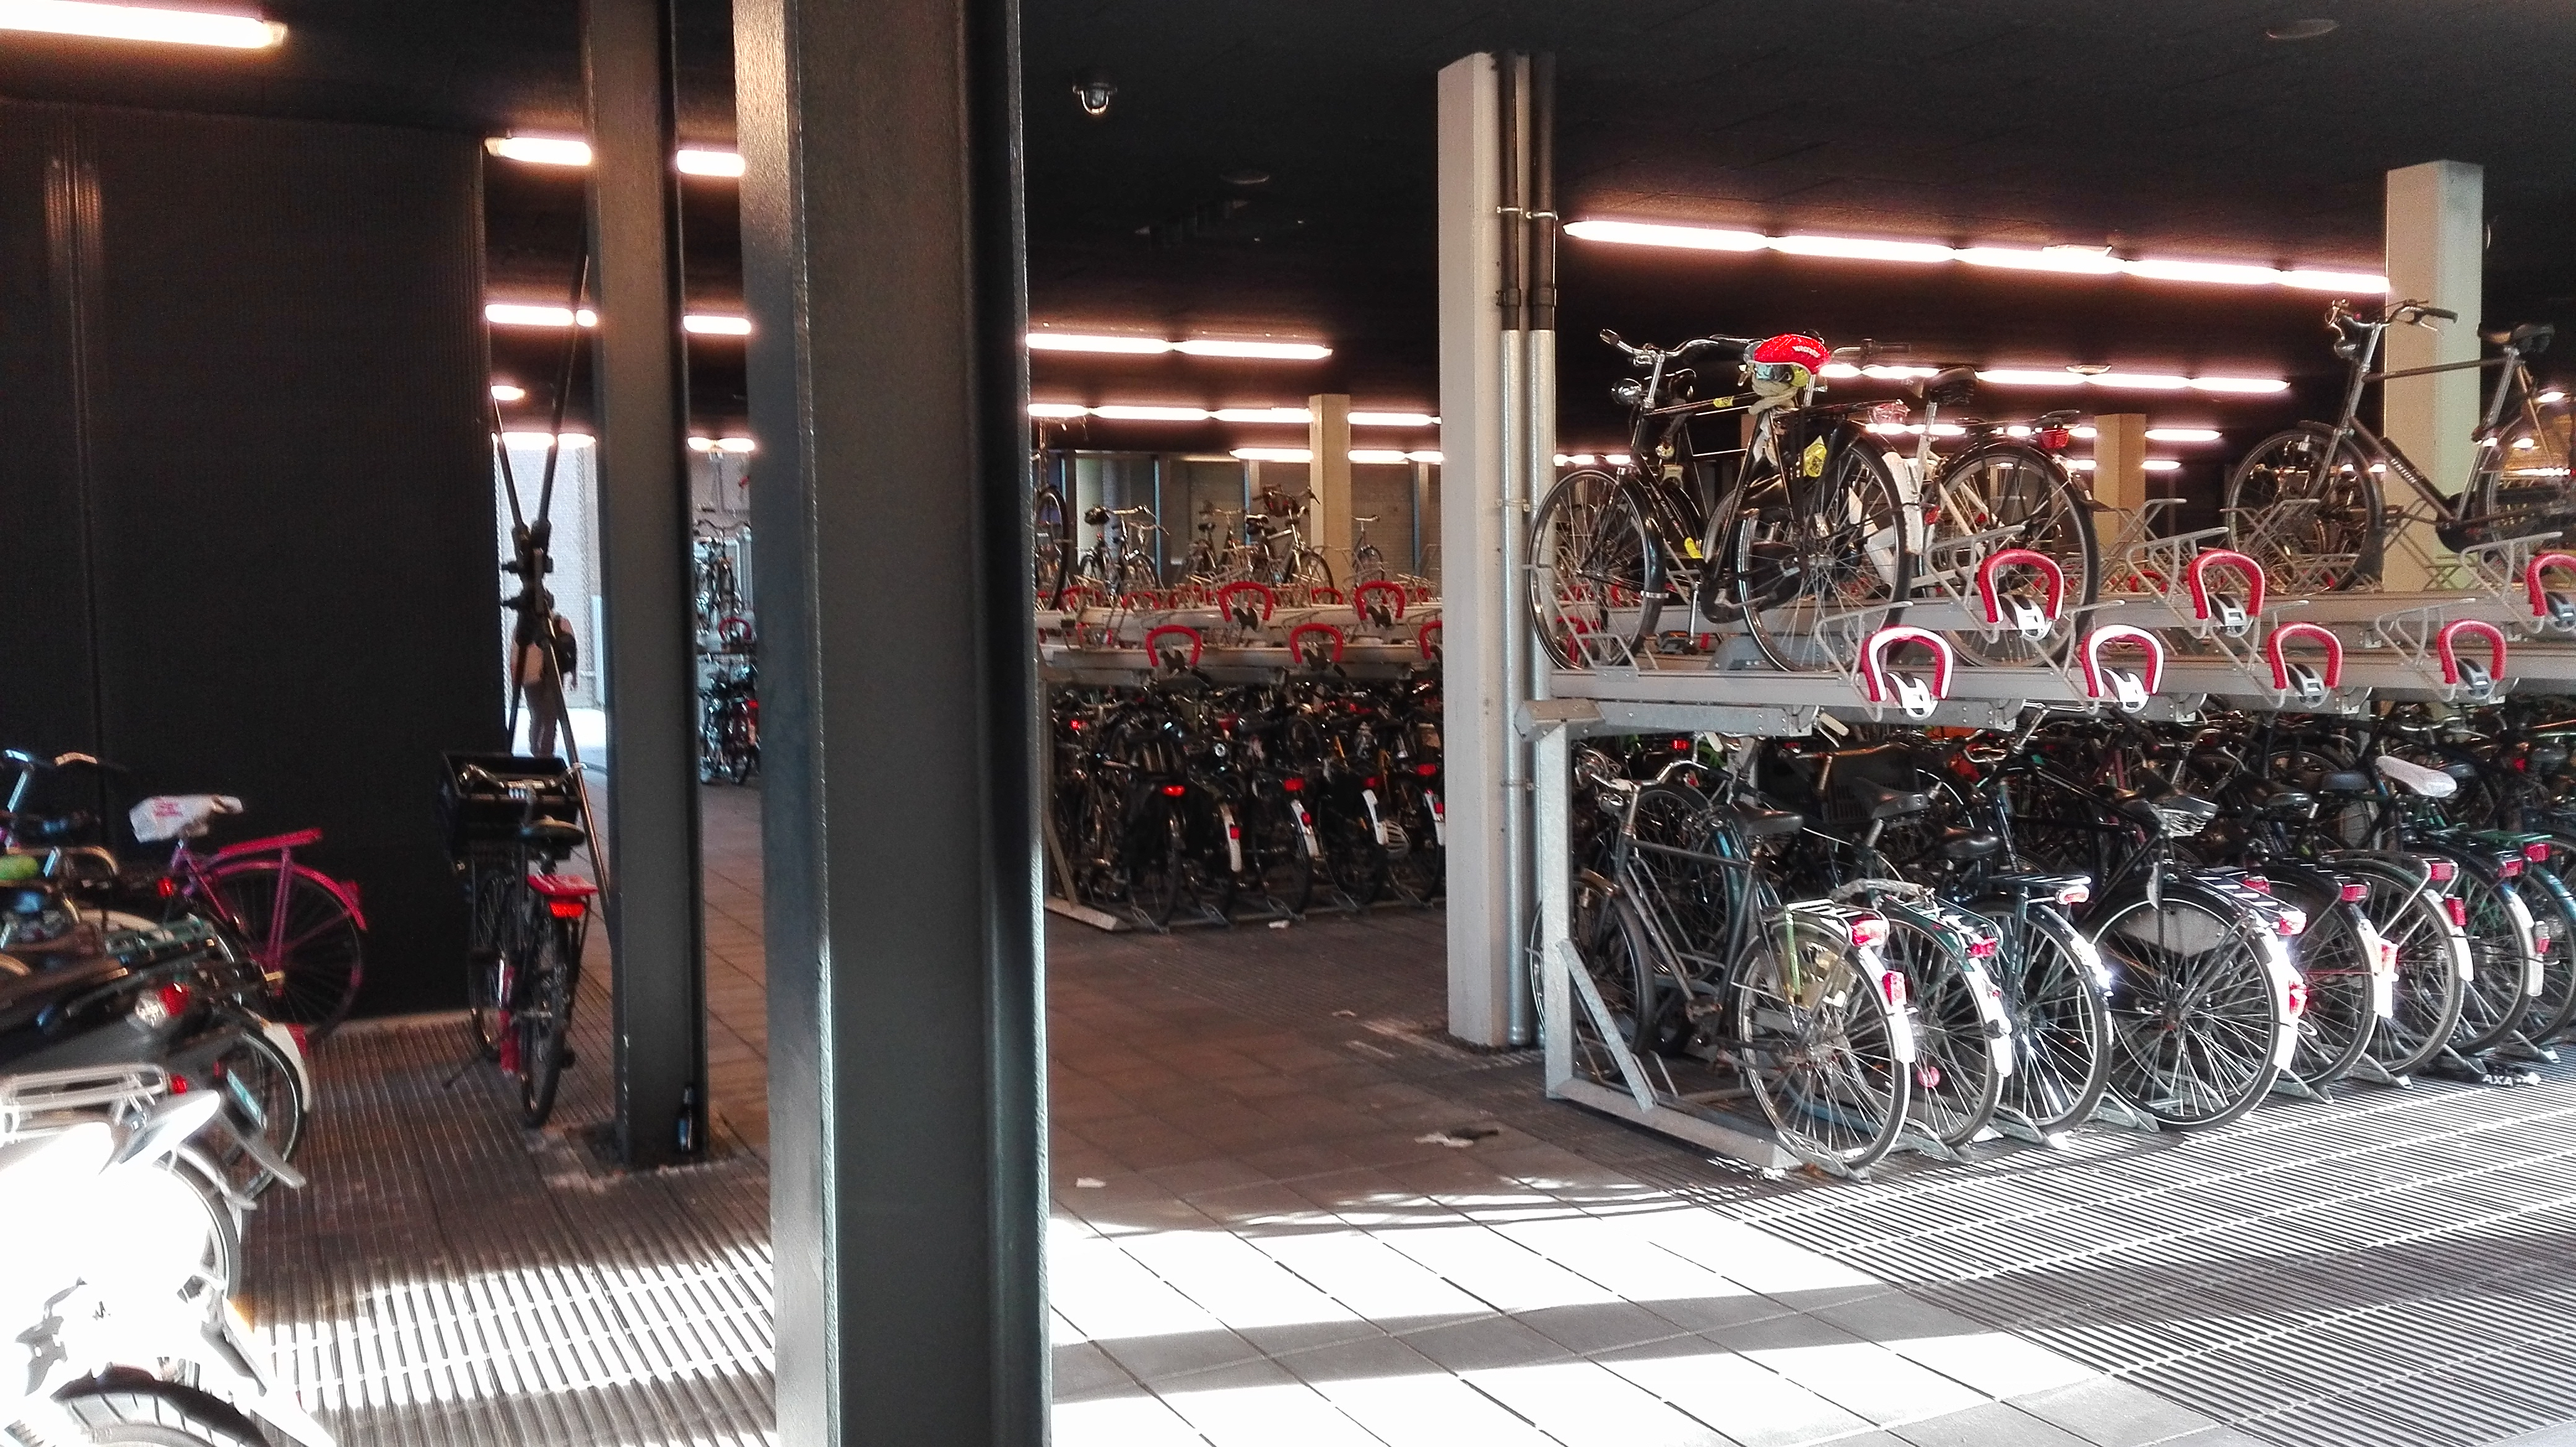 dużo rowerów holenderskich